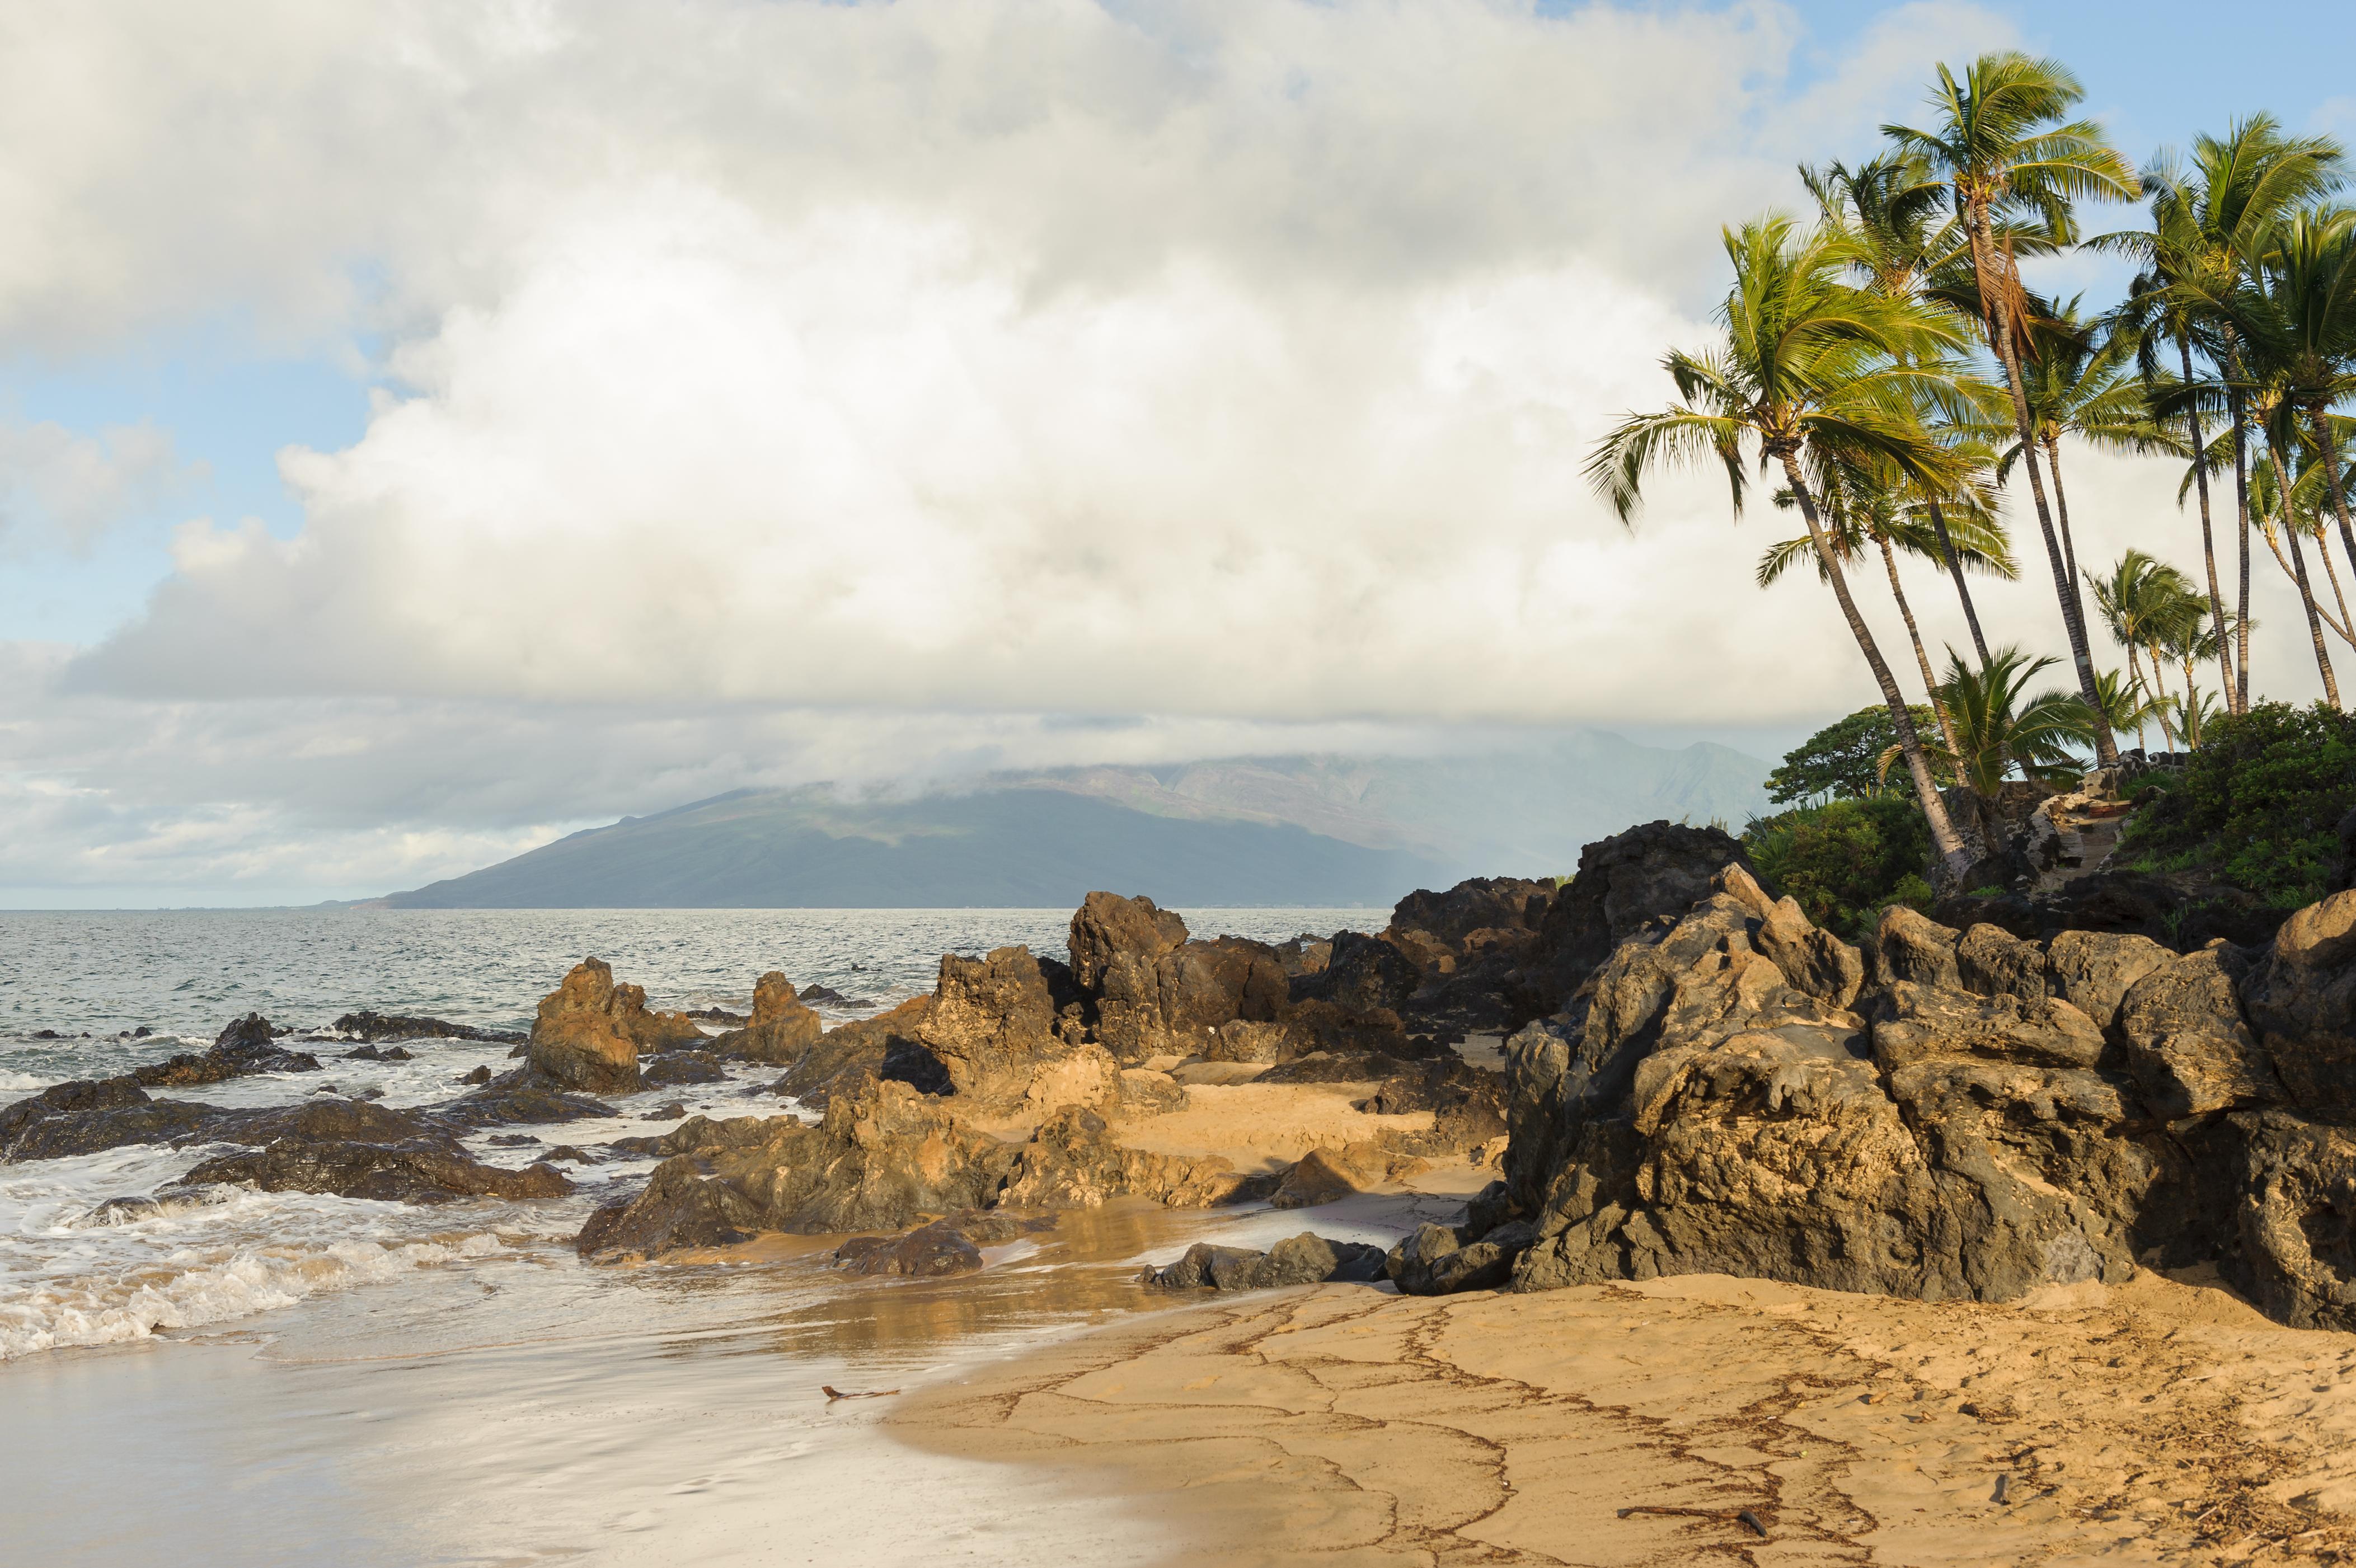 Photo source: wikimedia.org/wikipedia/commons/2/27/Maui,_Hawaii_beach.jpg